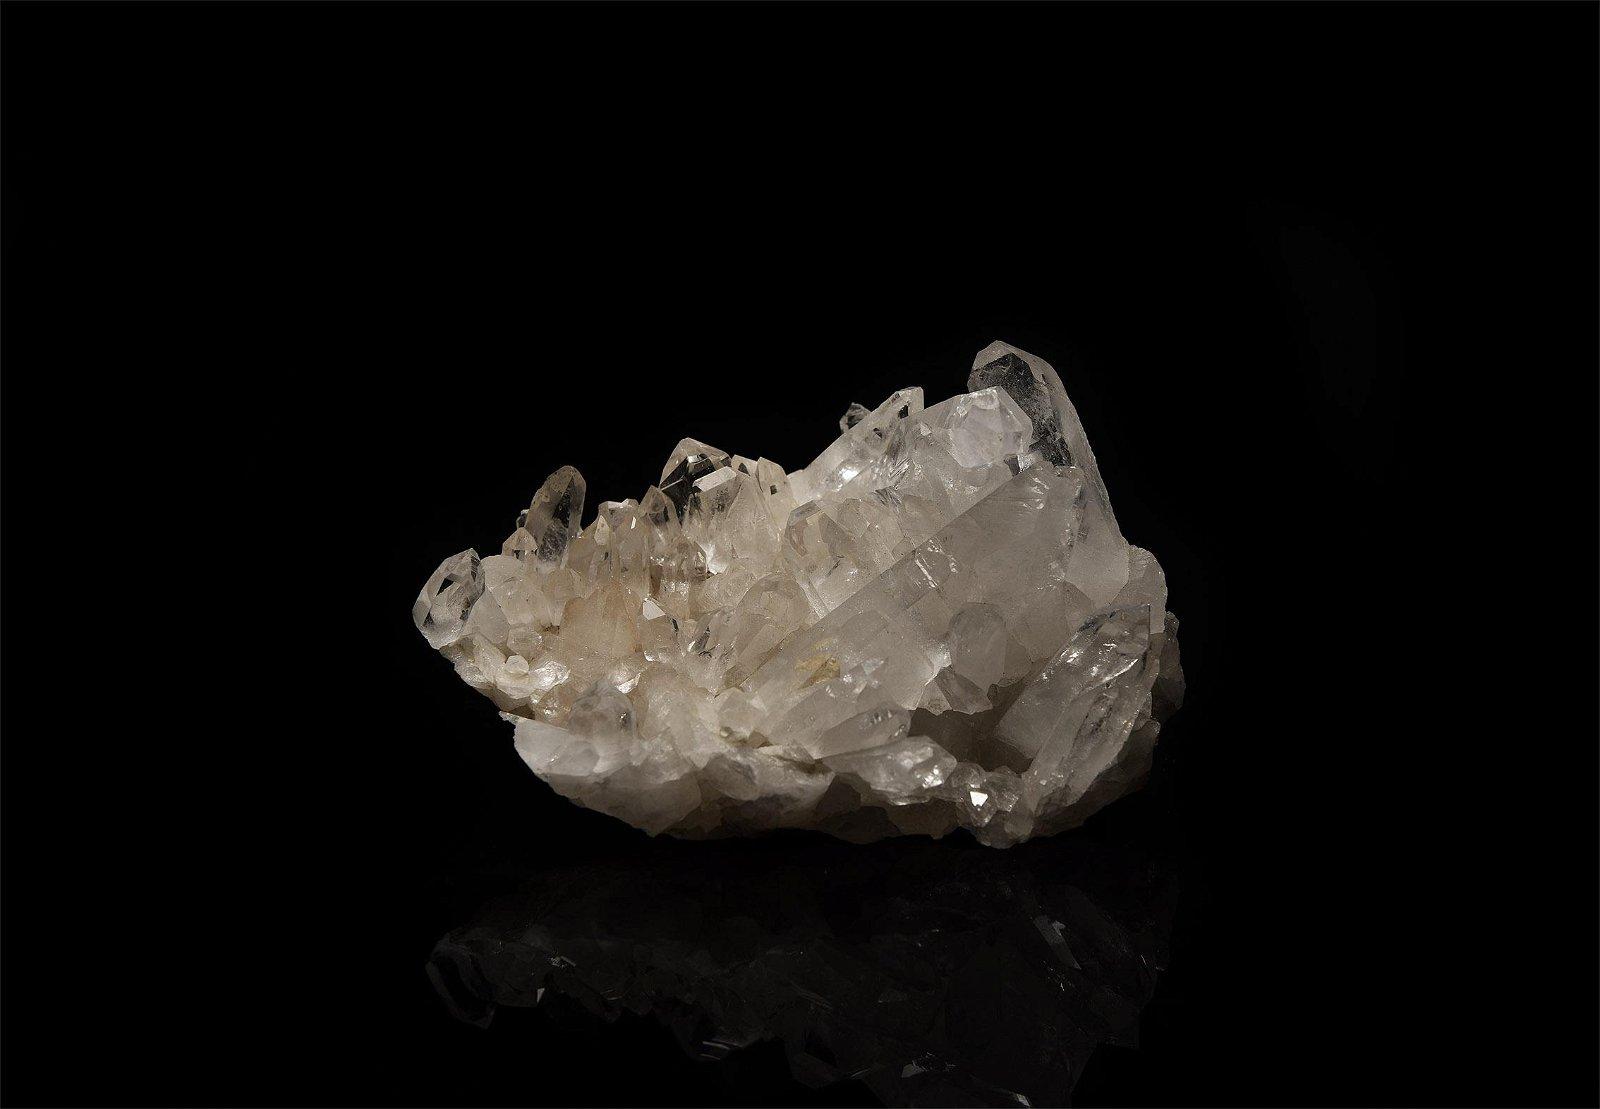 Quartz Crystal Mineral Specimen